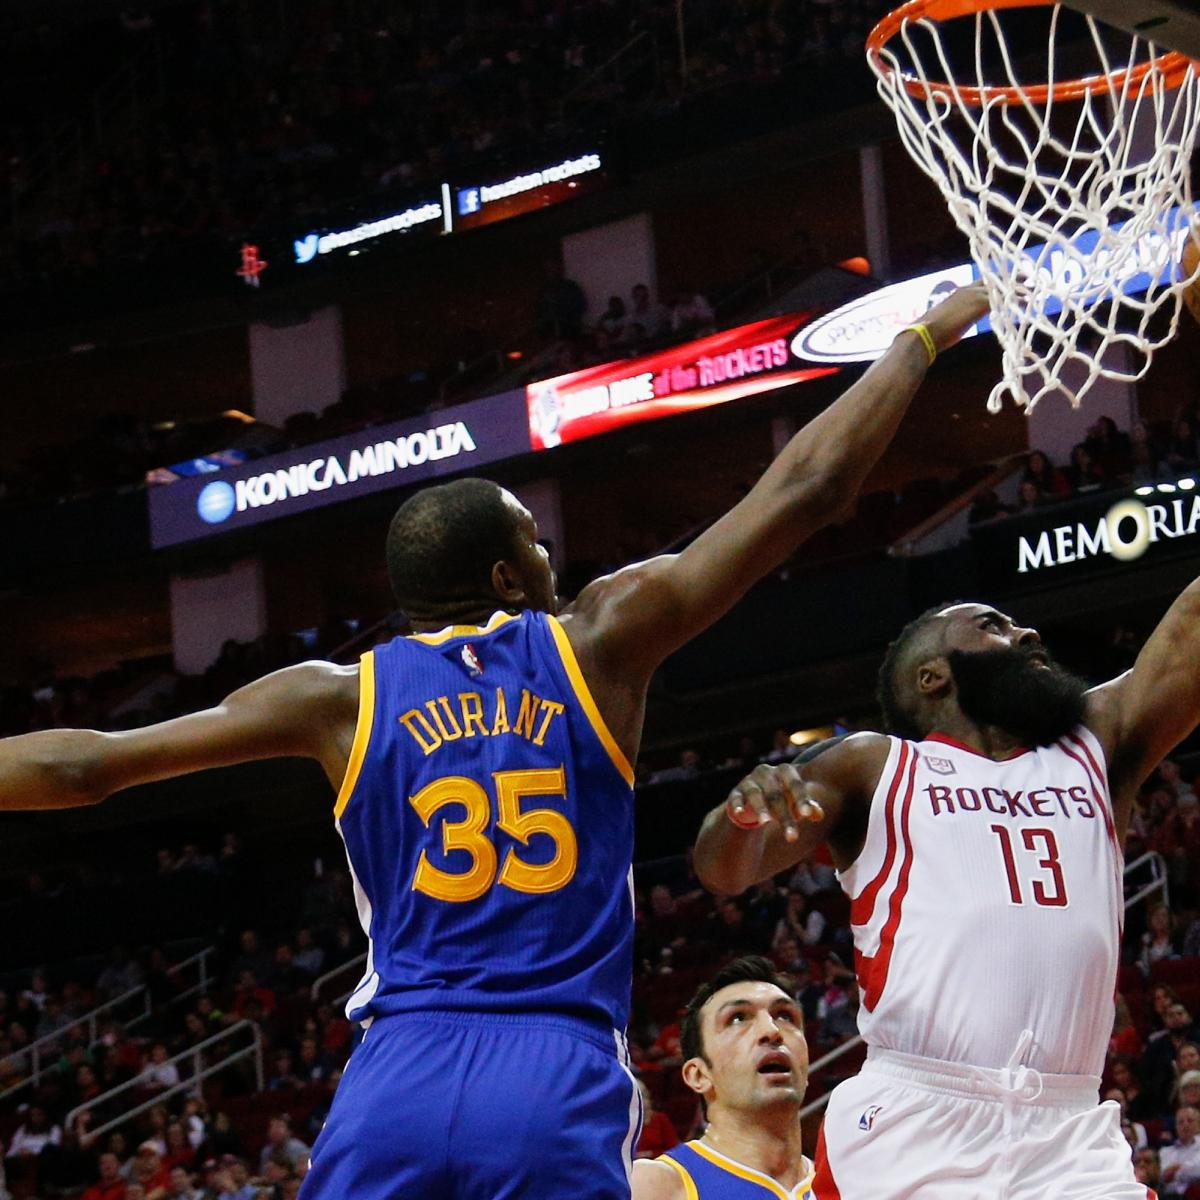 Rockets Vs Warriors January: Rockets-Warriors Rivalry Will Never Be Unless Houston Gets